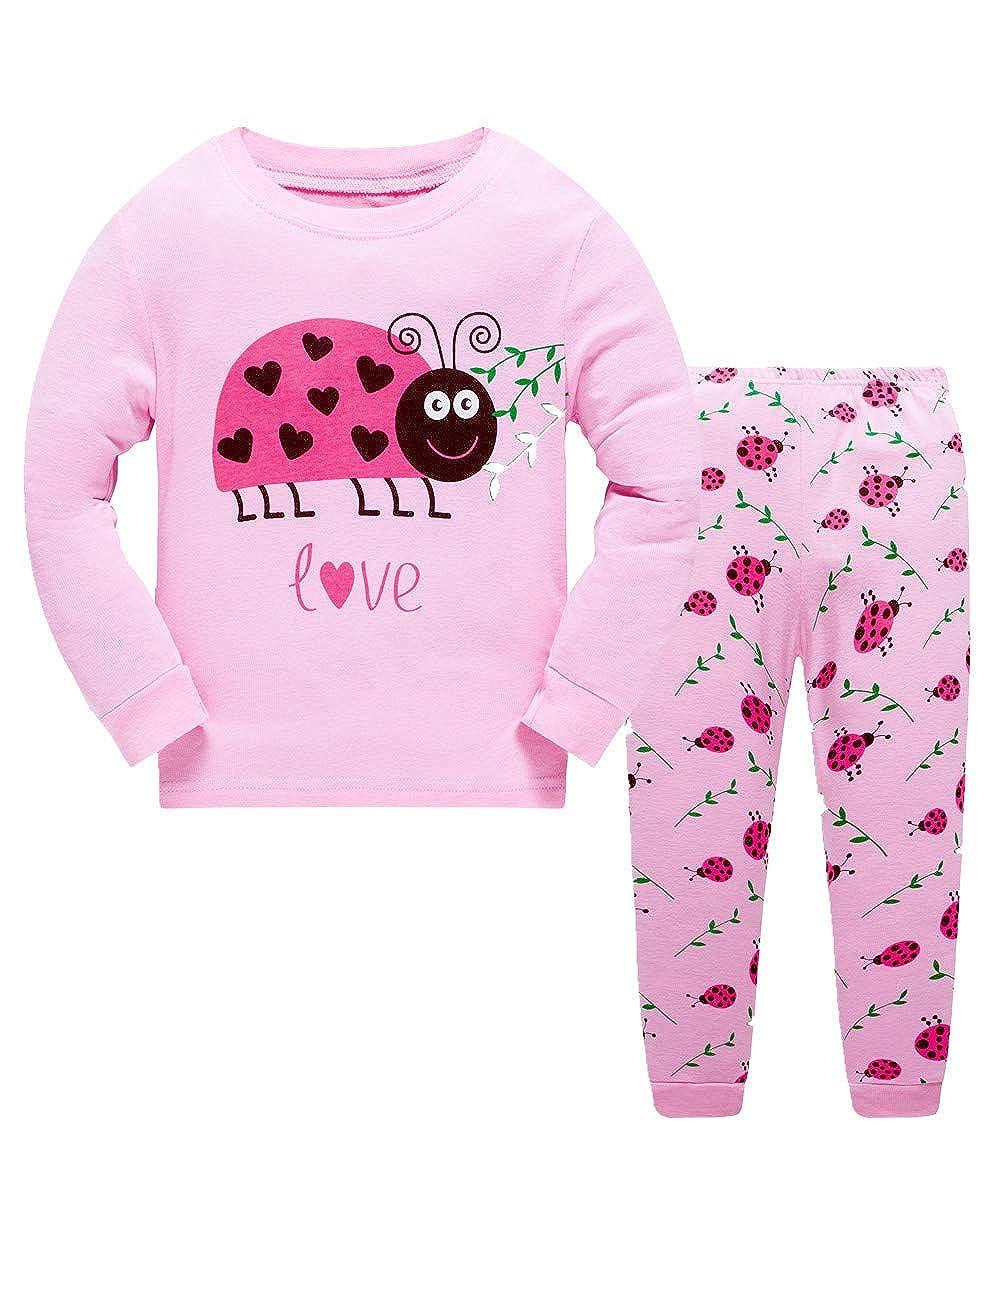 Girls Pajamas Set 100% Cotton Cartoon Long Sleeve Sleepwear Little Kids Winter Pjs Clothes for Children BABSUE BB-Girls